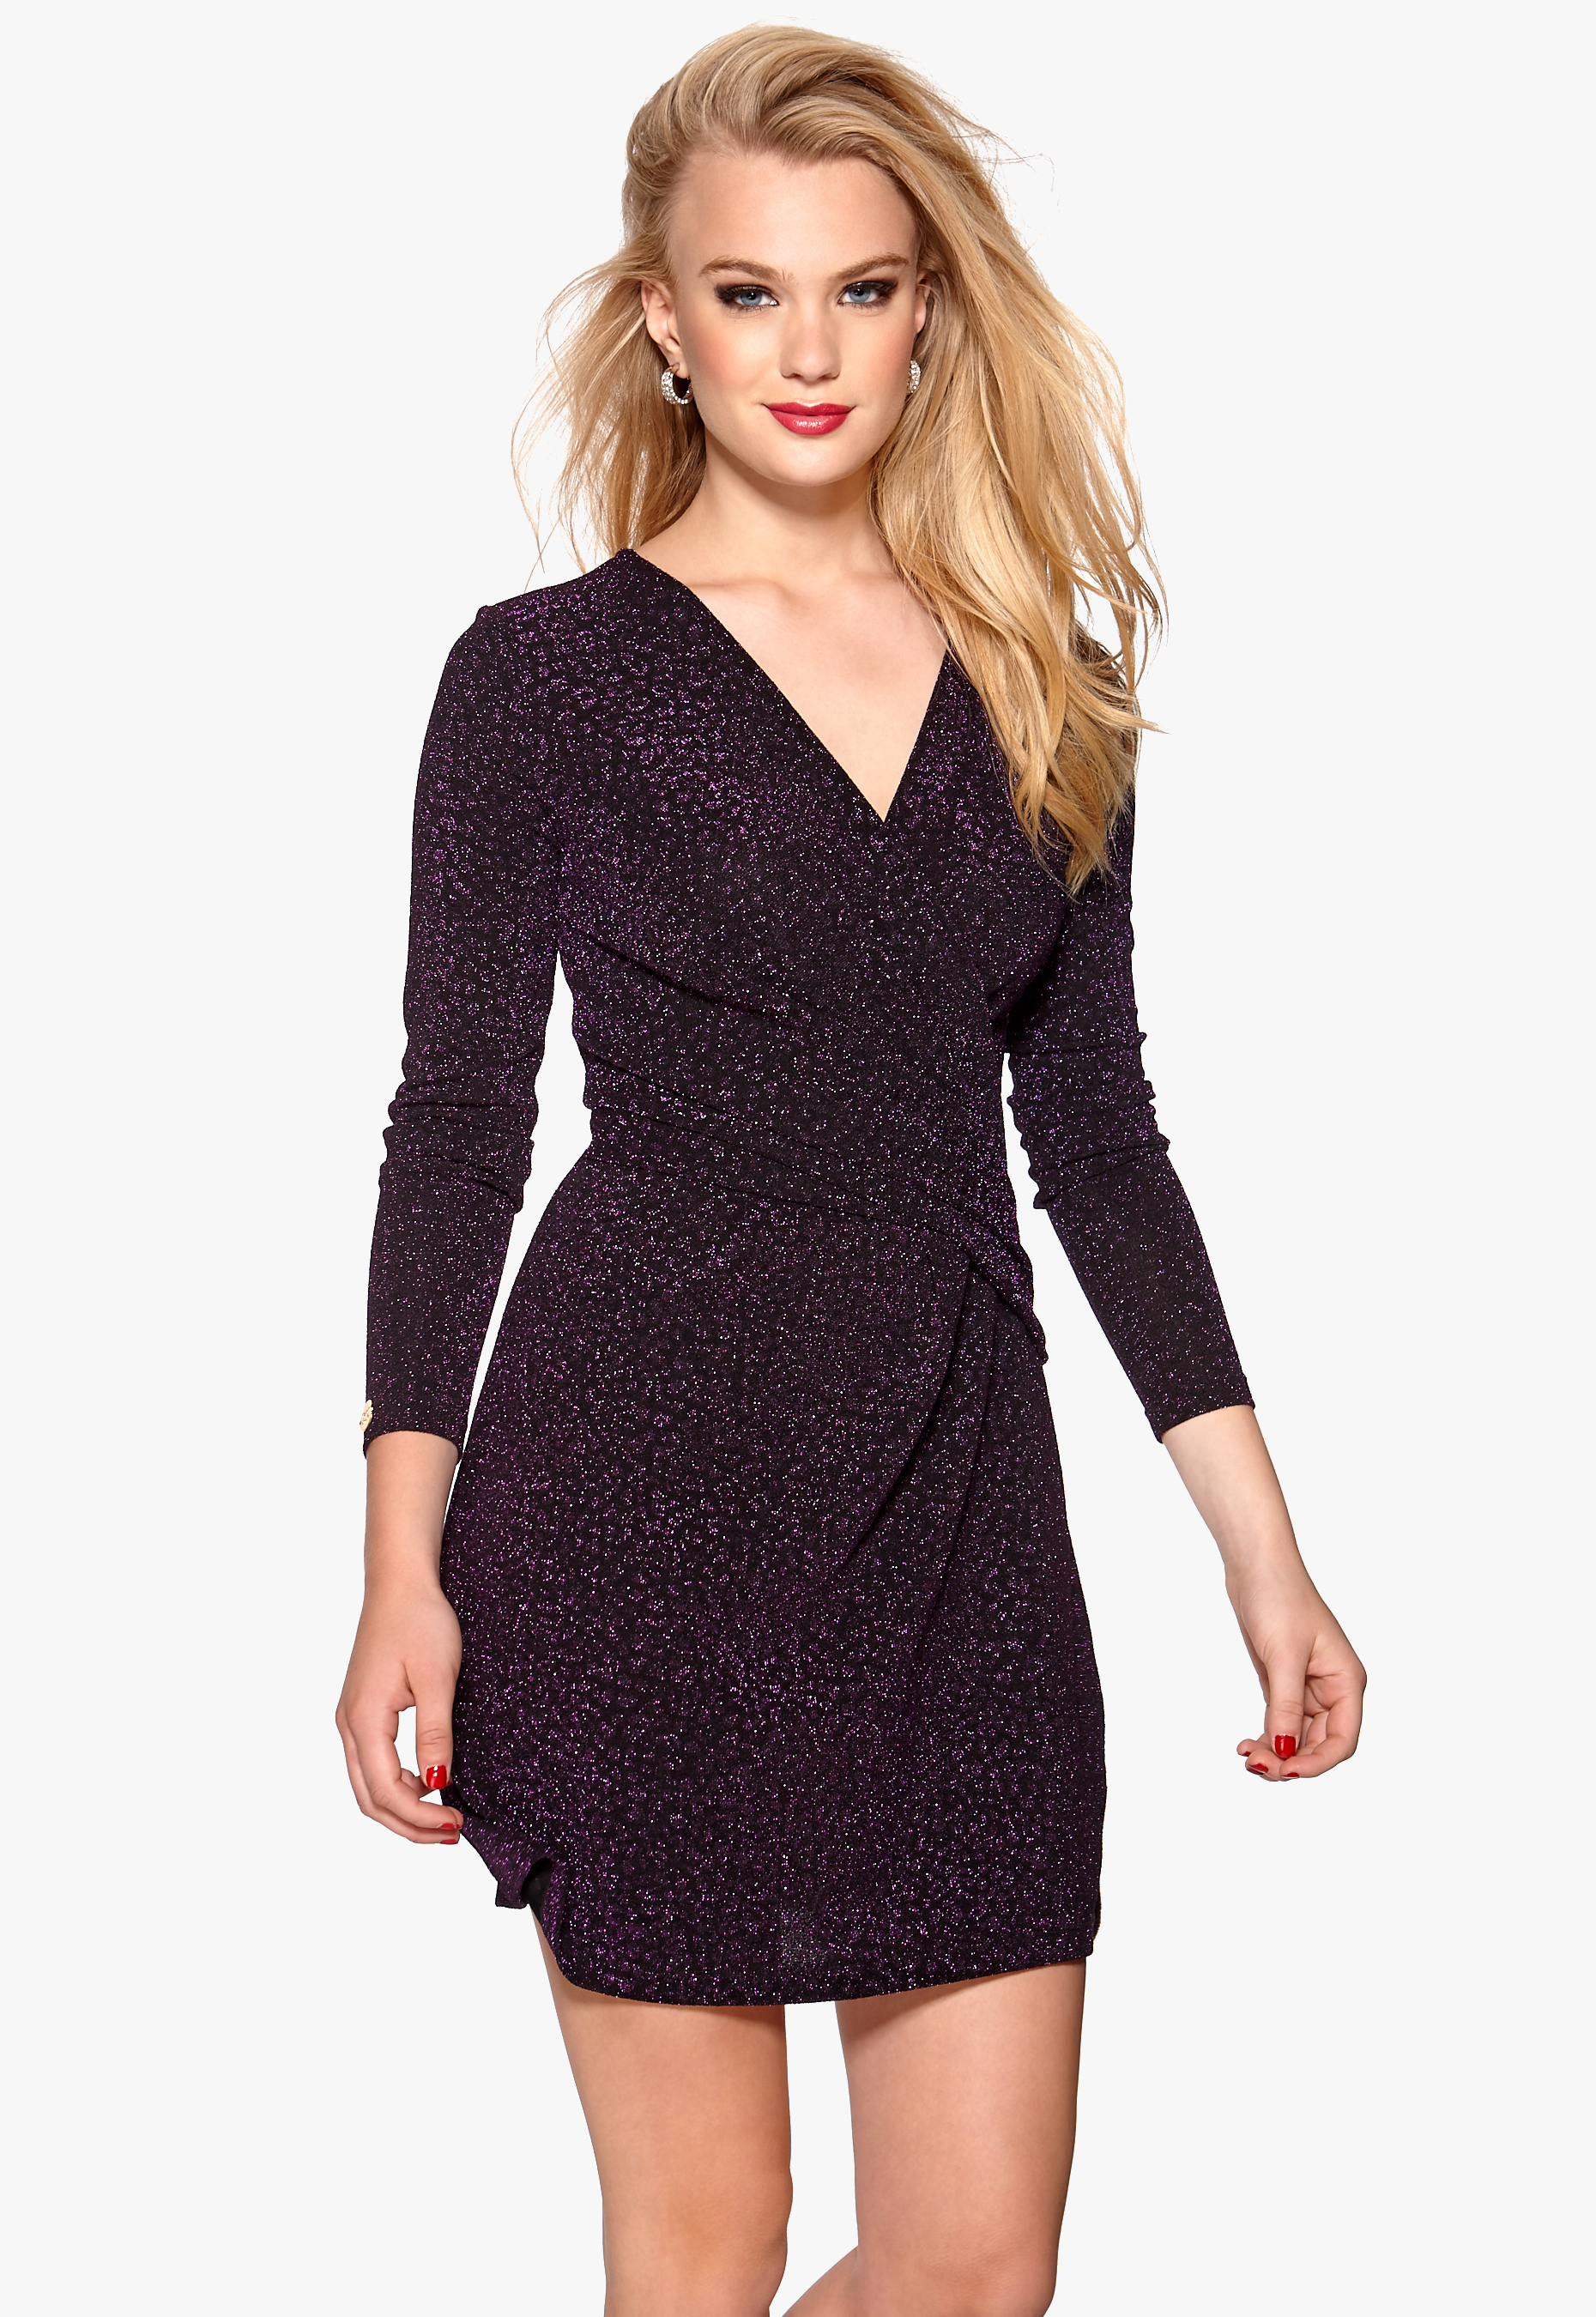 Saada Chiara Forthi Lumina dress Black White Beige XS